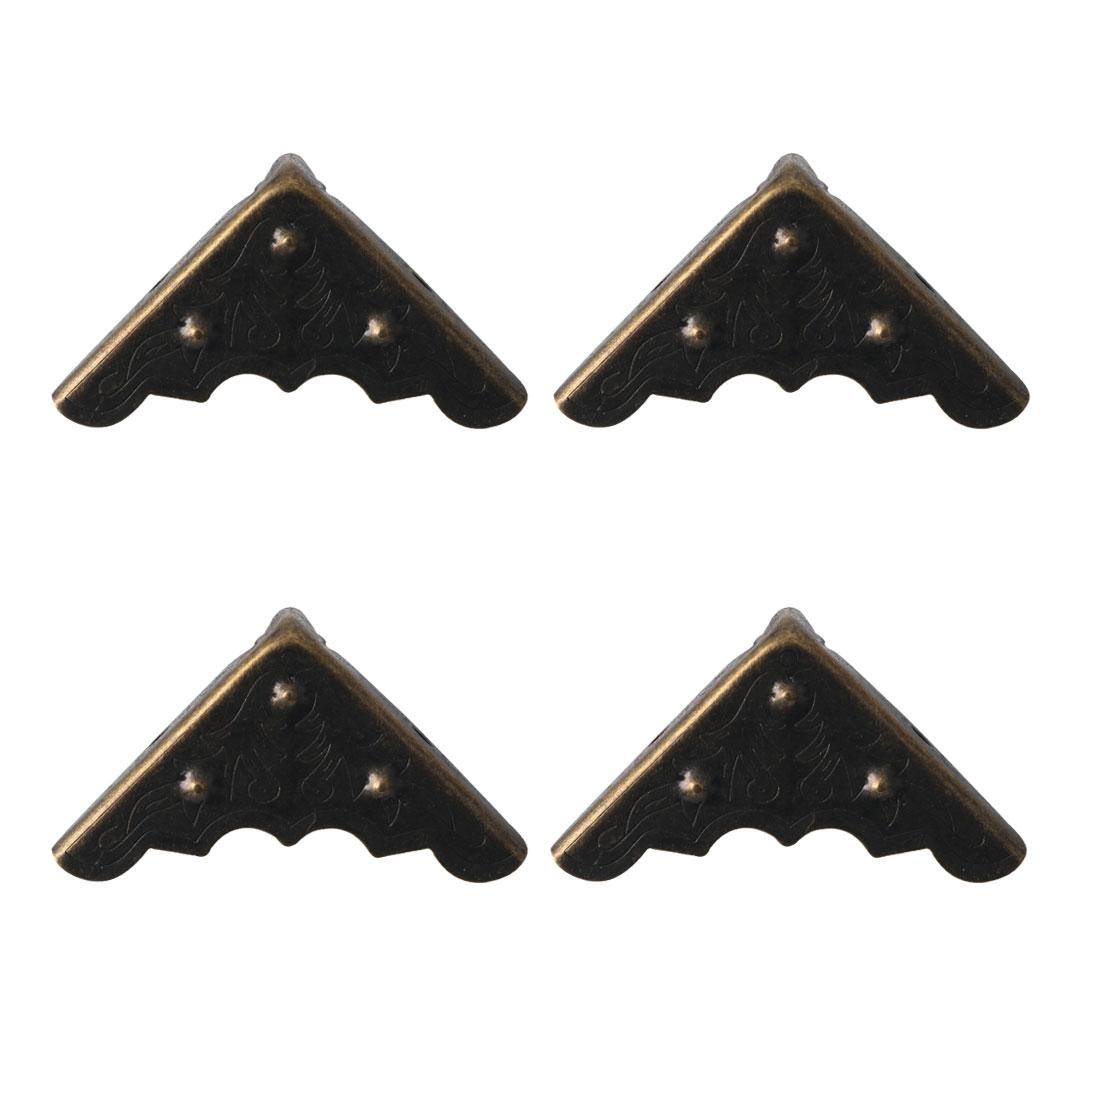 4pcs Box Corner Protector Bronze Tone Triangle Frame Box Furniture Protectors